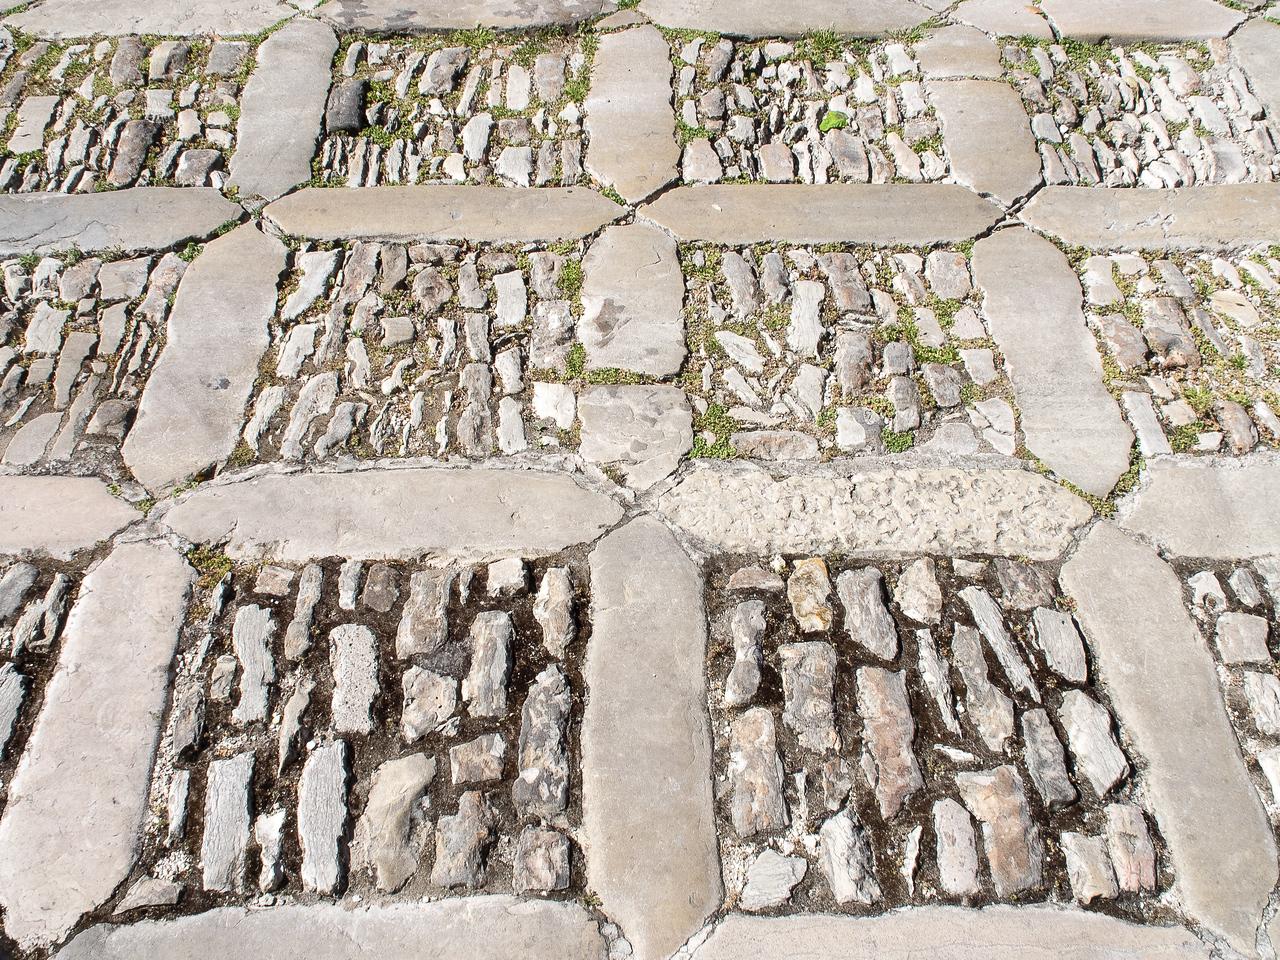 Unusual cobblestone patterned street